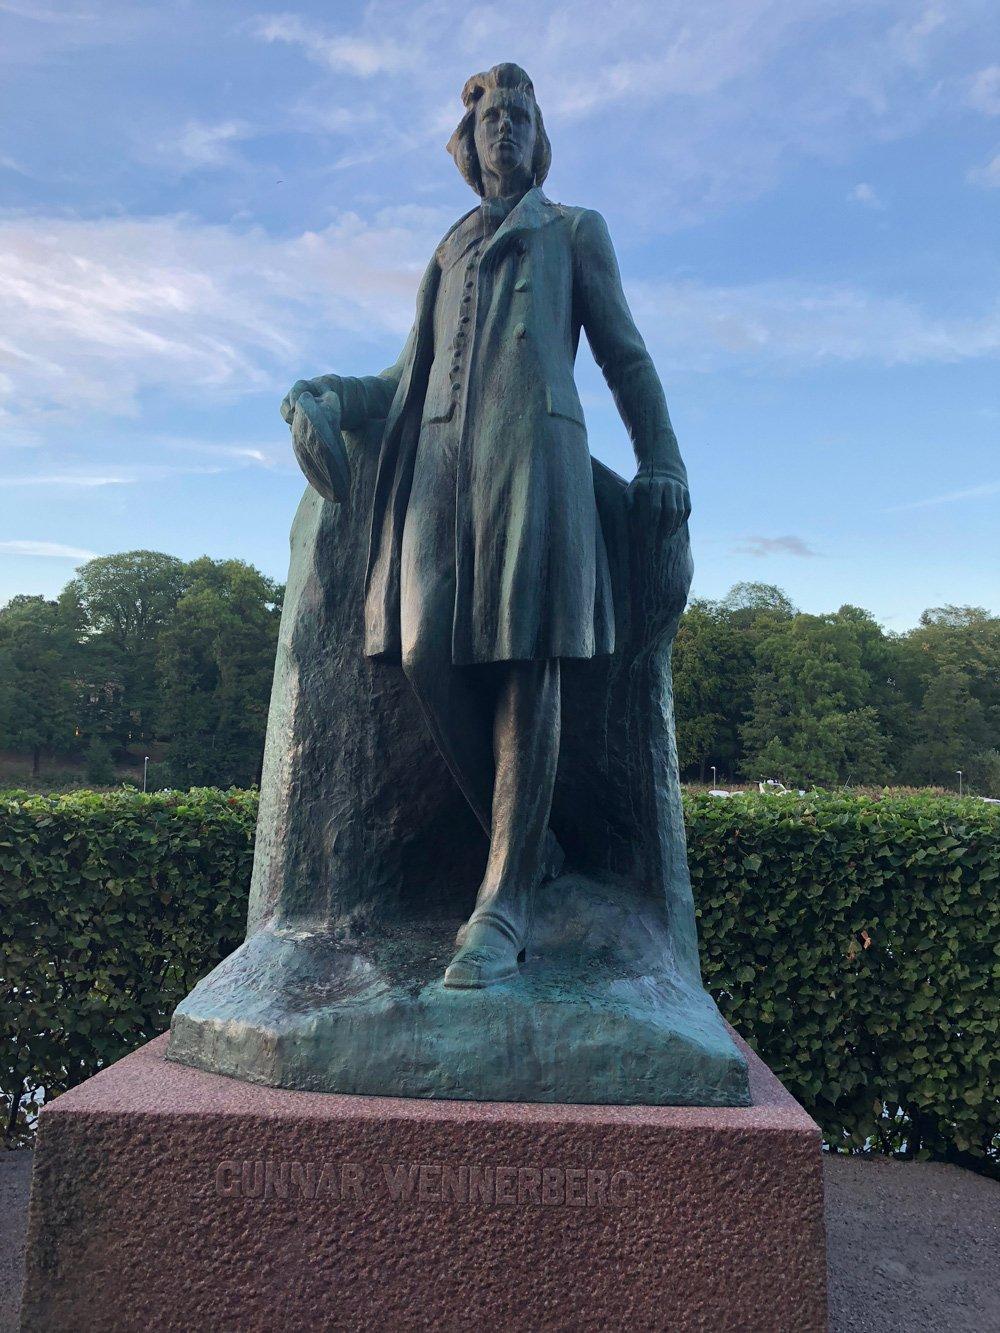 Gunnar Wennerberg, Carl Eldh, Djurgården